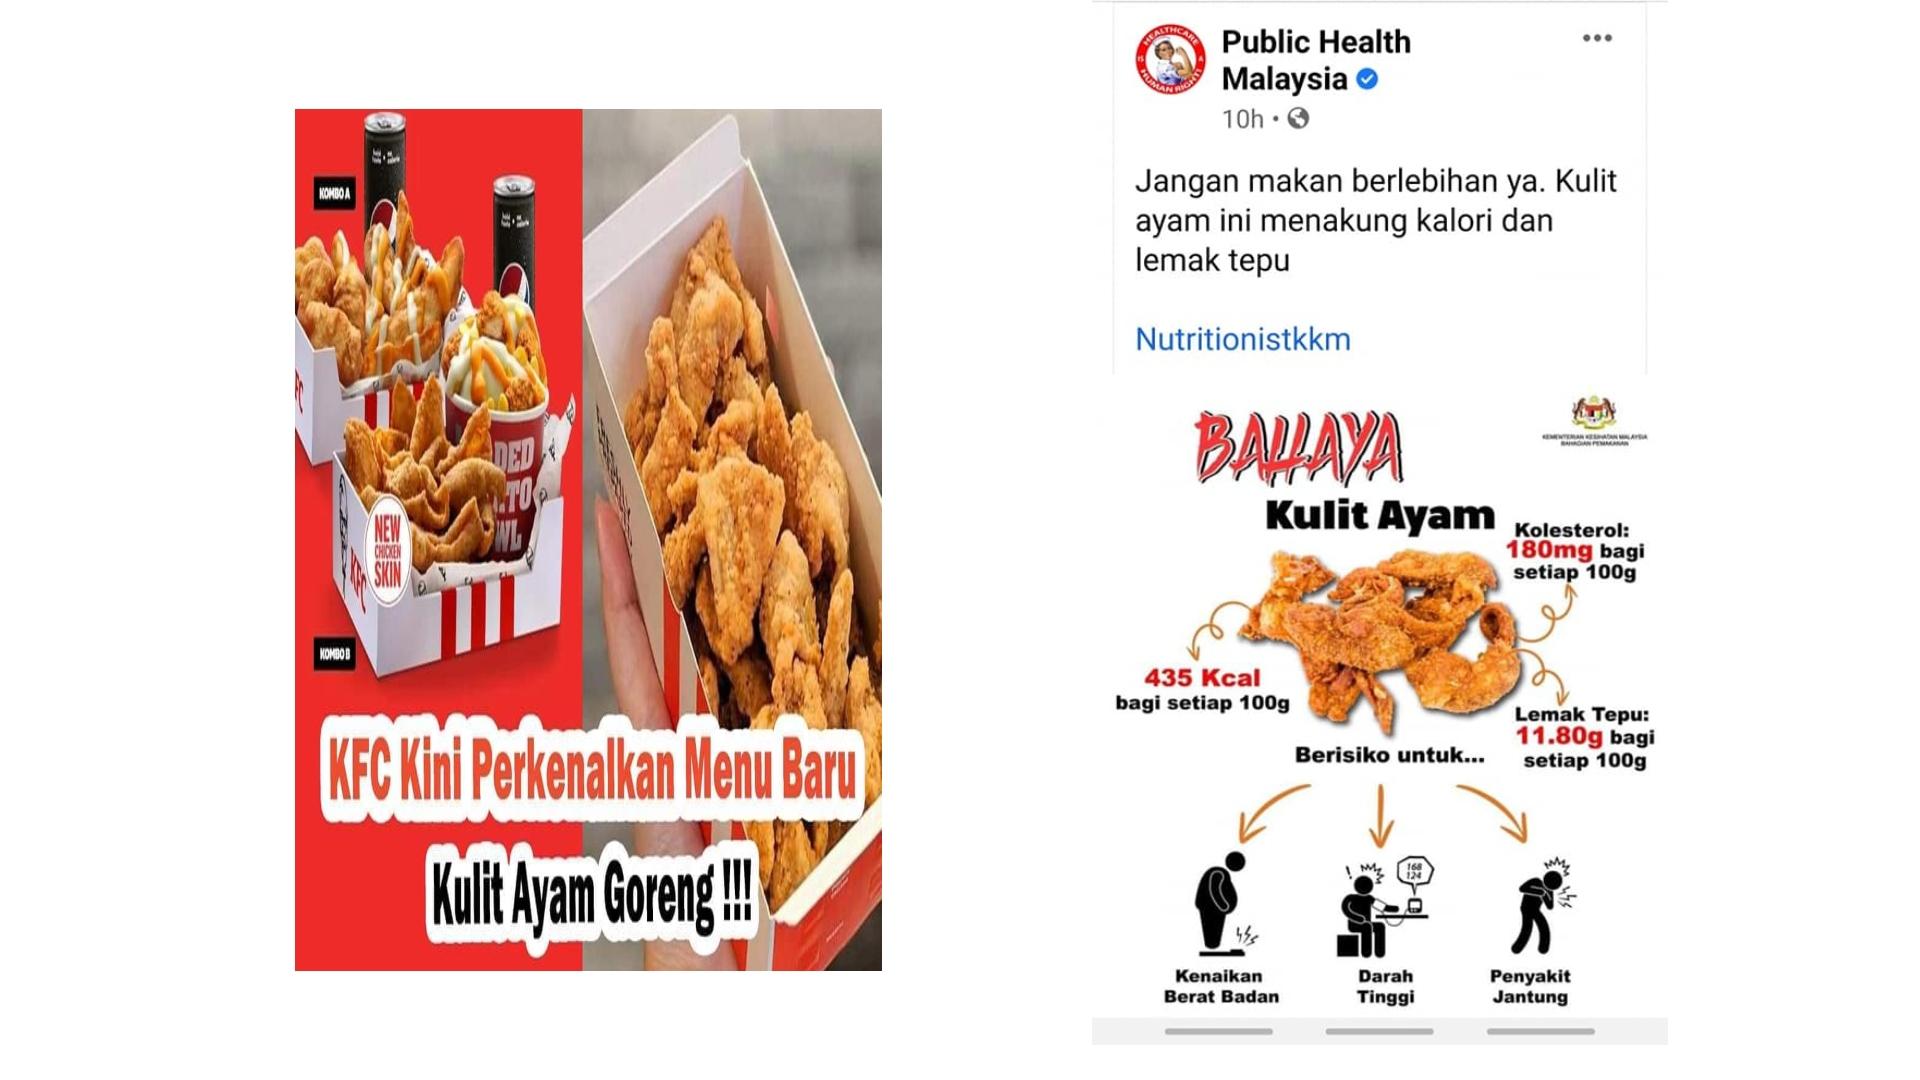 KKM cited the dangerous of fried chicken skin for health